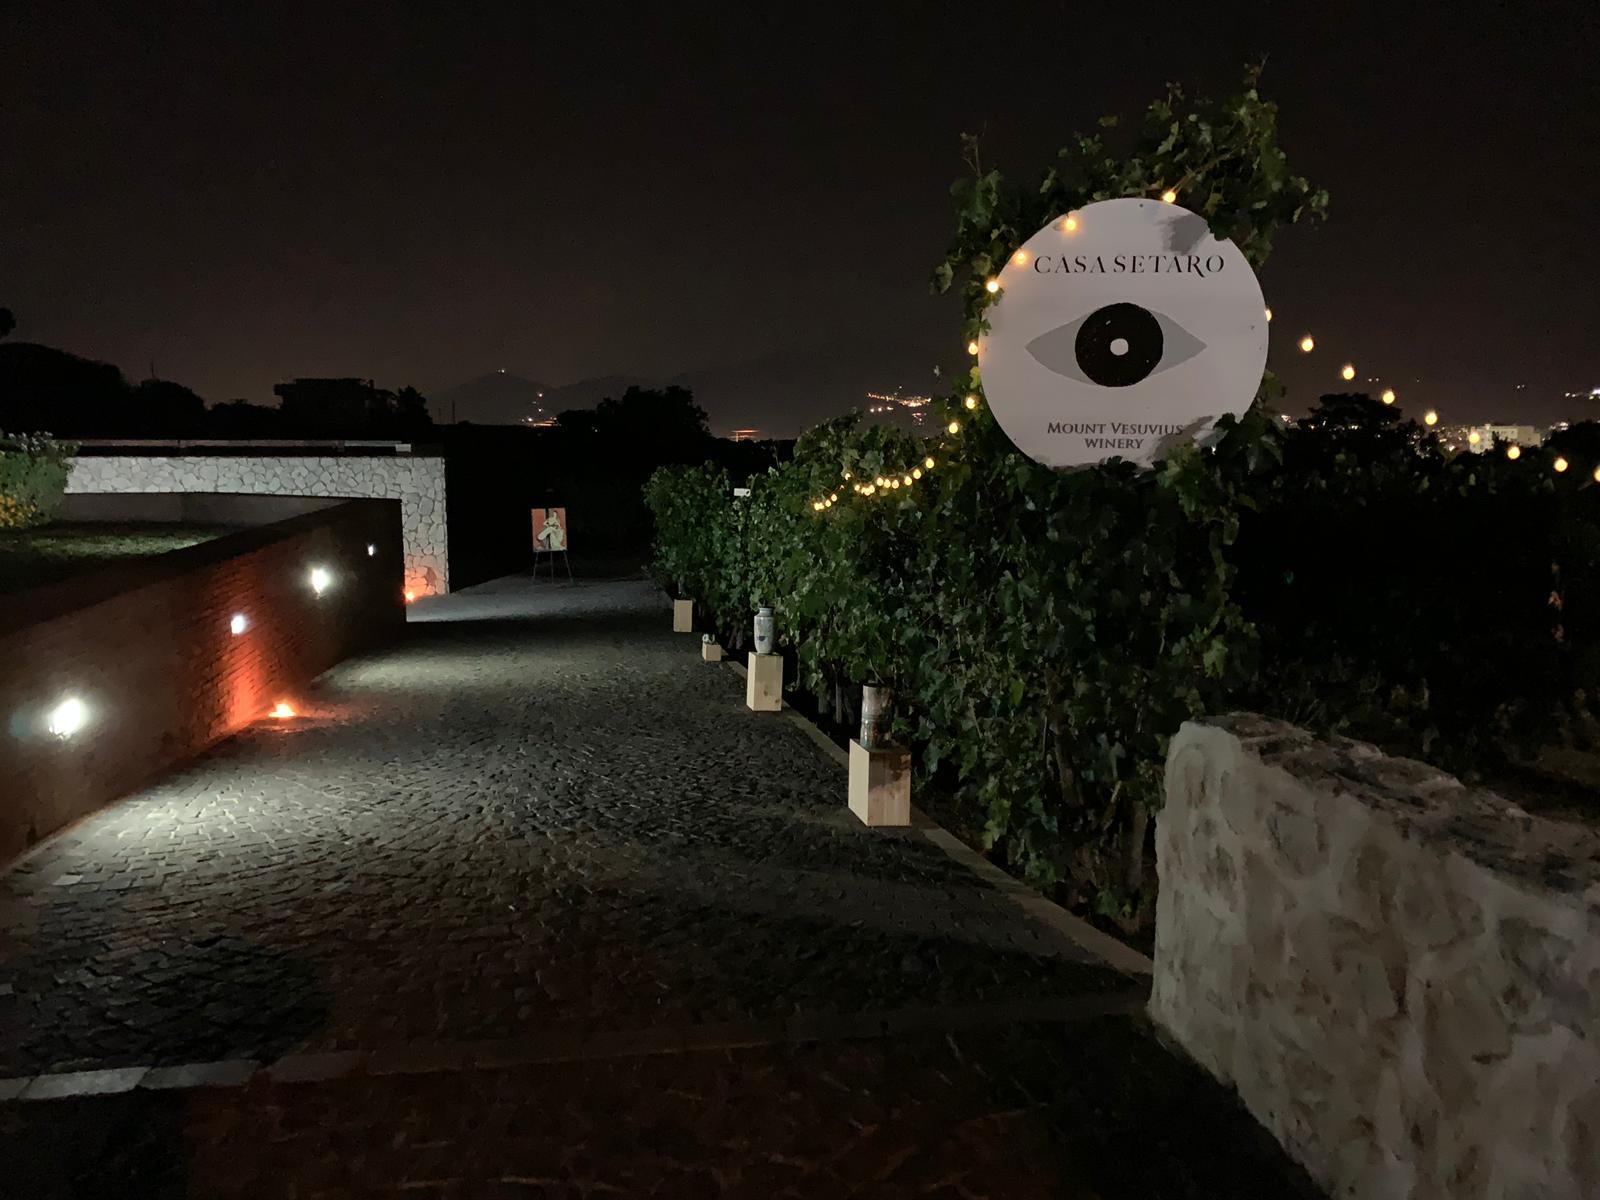 Casa Setaro - vigna di notte